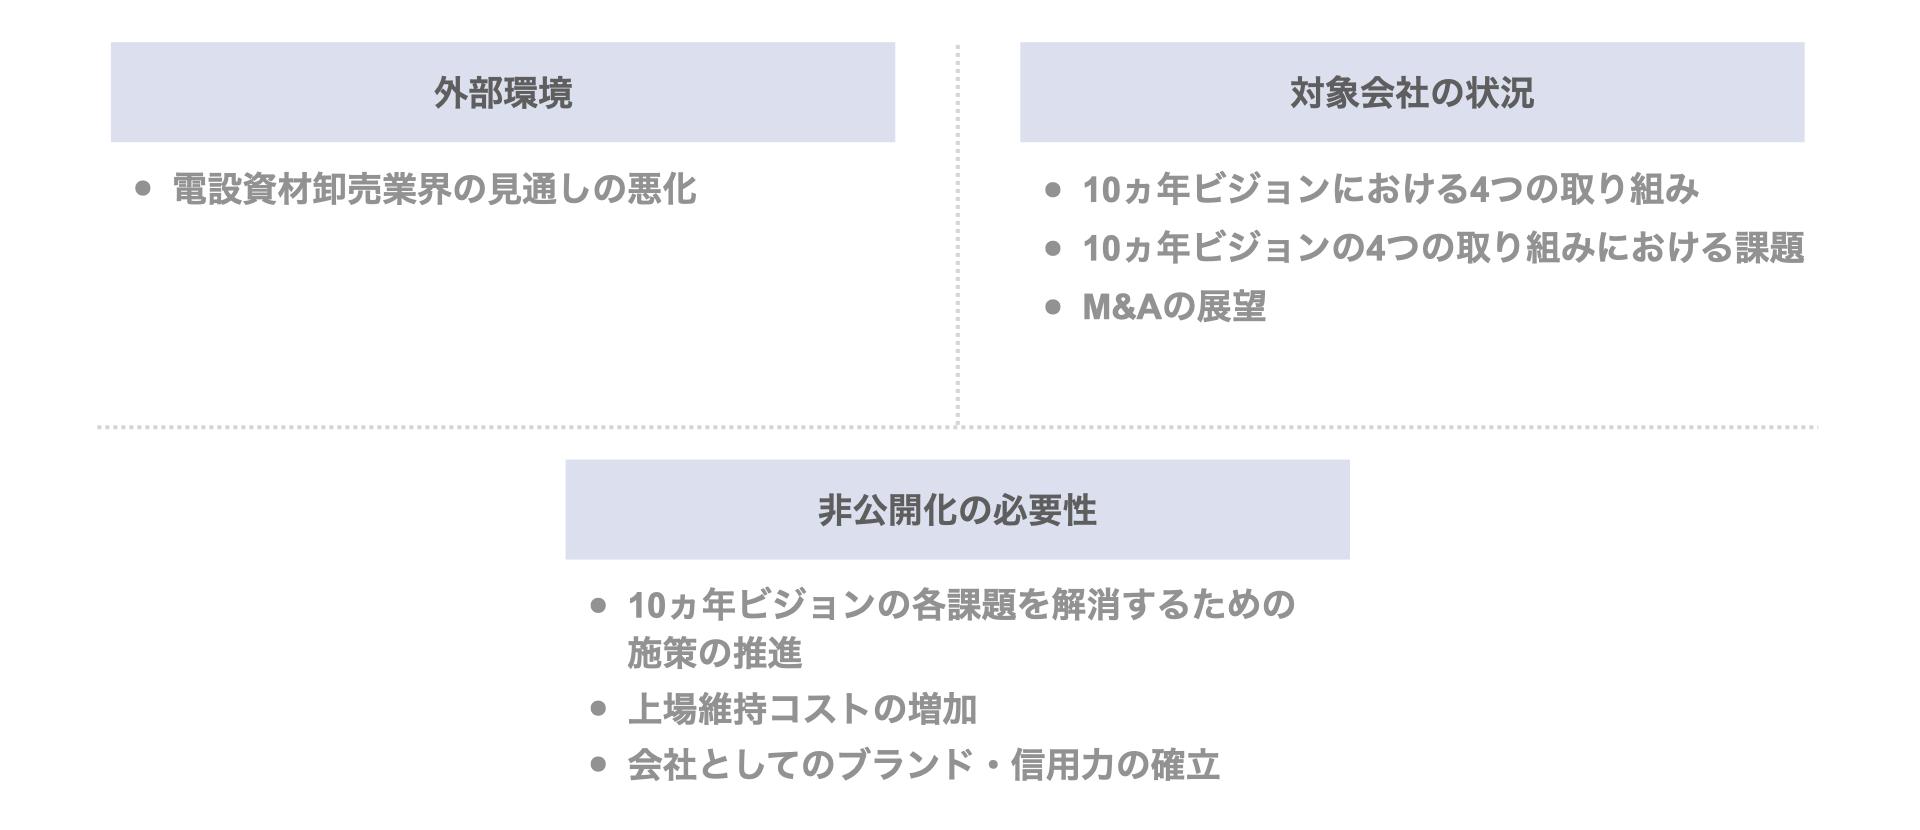 MBO事例 愛光電気のデットMBOによる非公開化(横浜銀行)の背景・目的